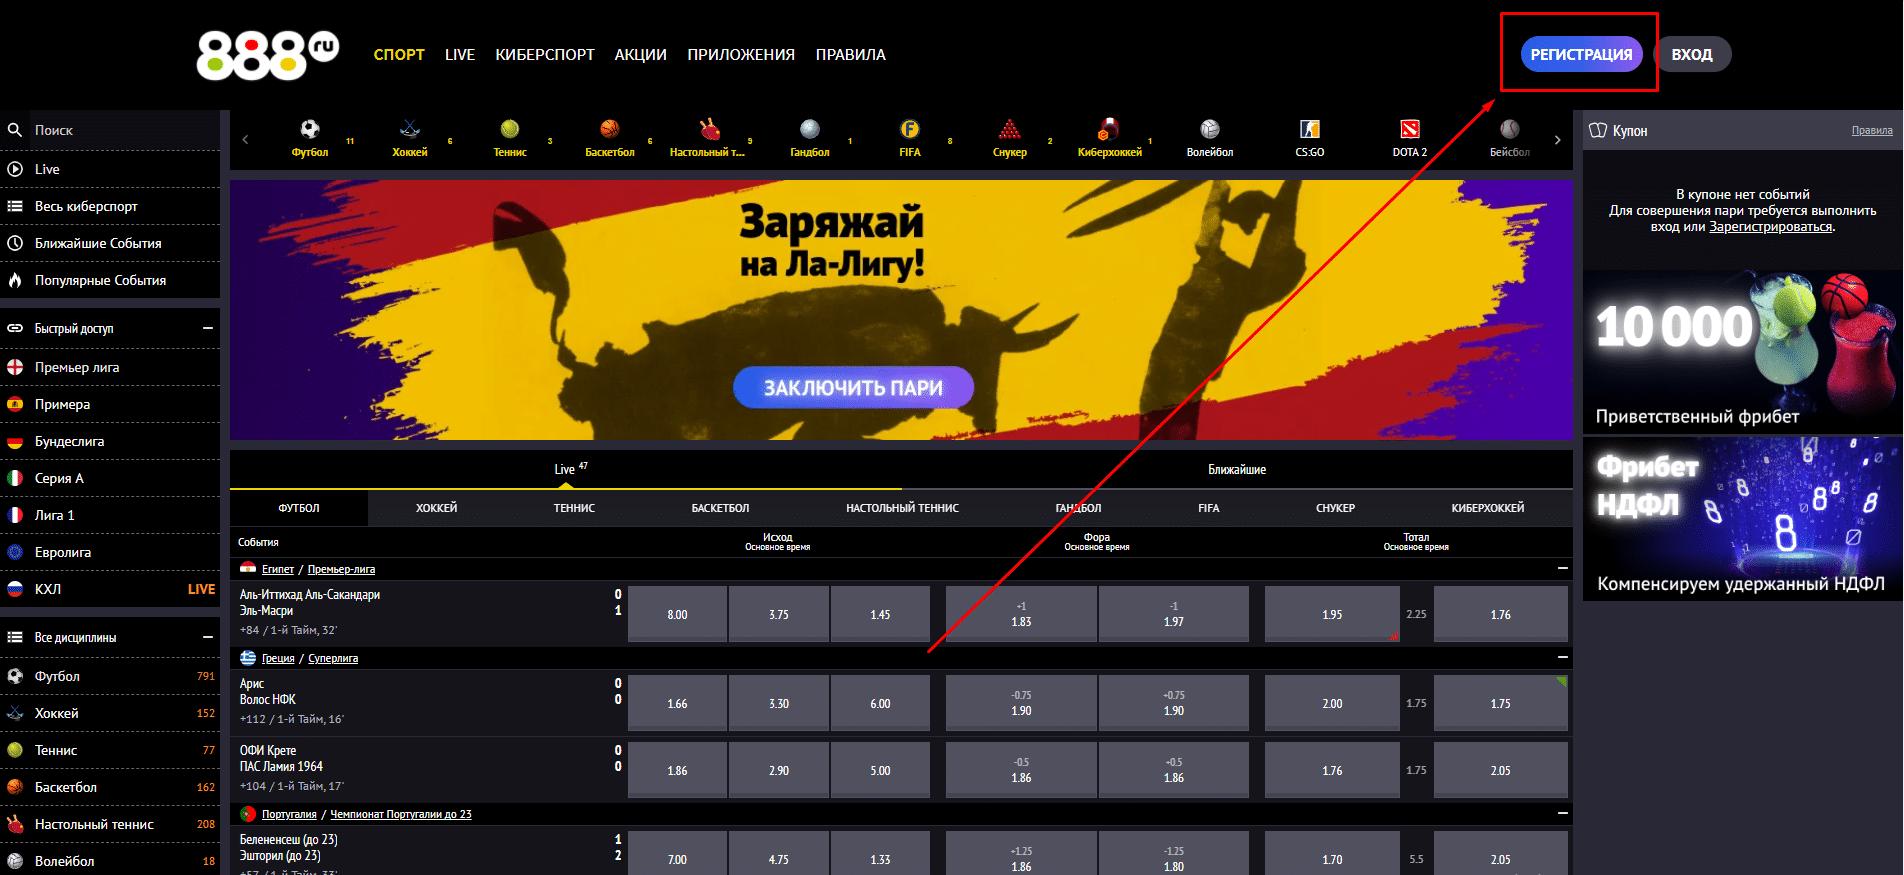 Кнопка регистрации на сайте 888.ru